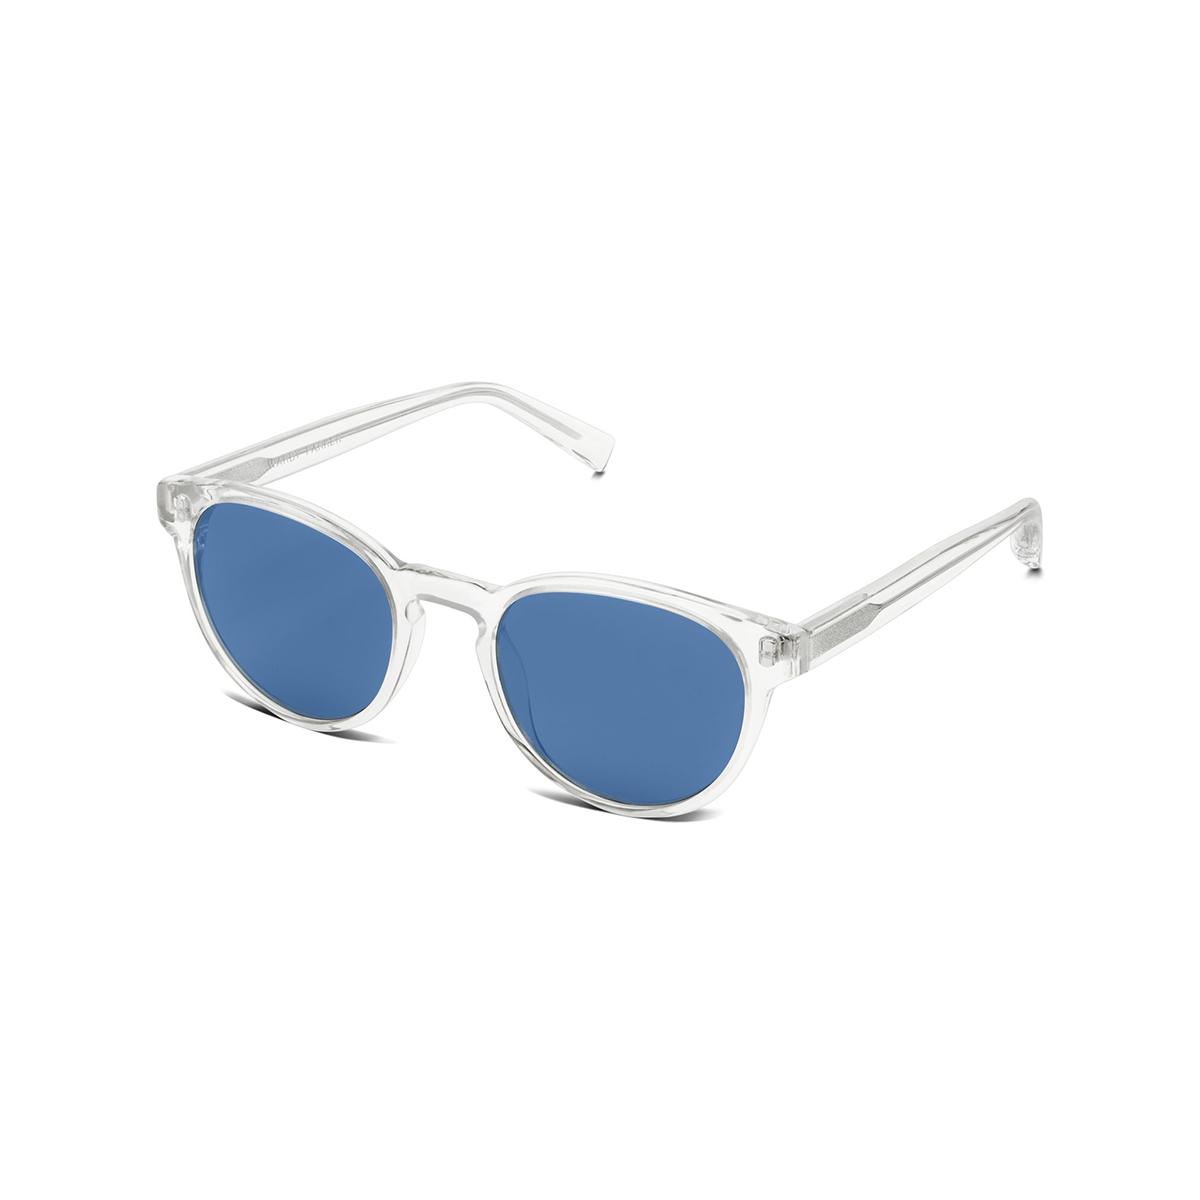 3bc633a5c Percy Sunglasses – MrBara Home SungLass